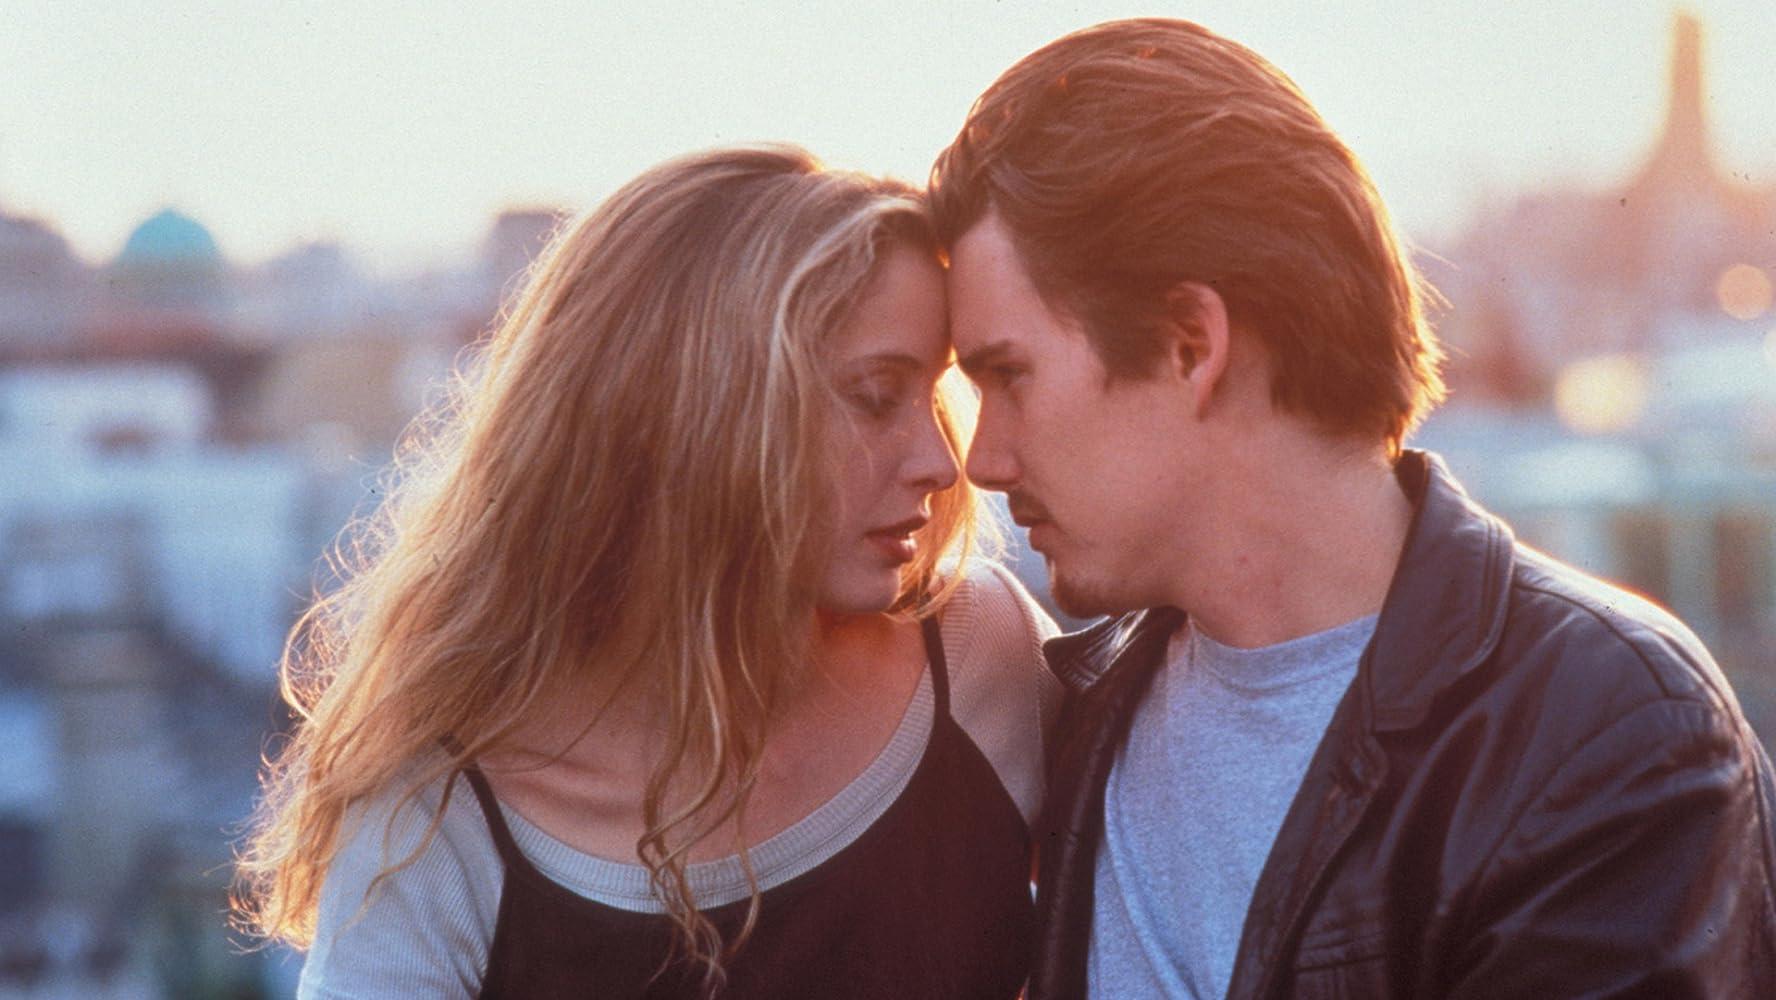 películas de 1995: Antes de amanecer, dirigida por Richard Linklater